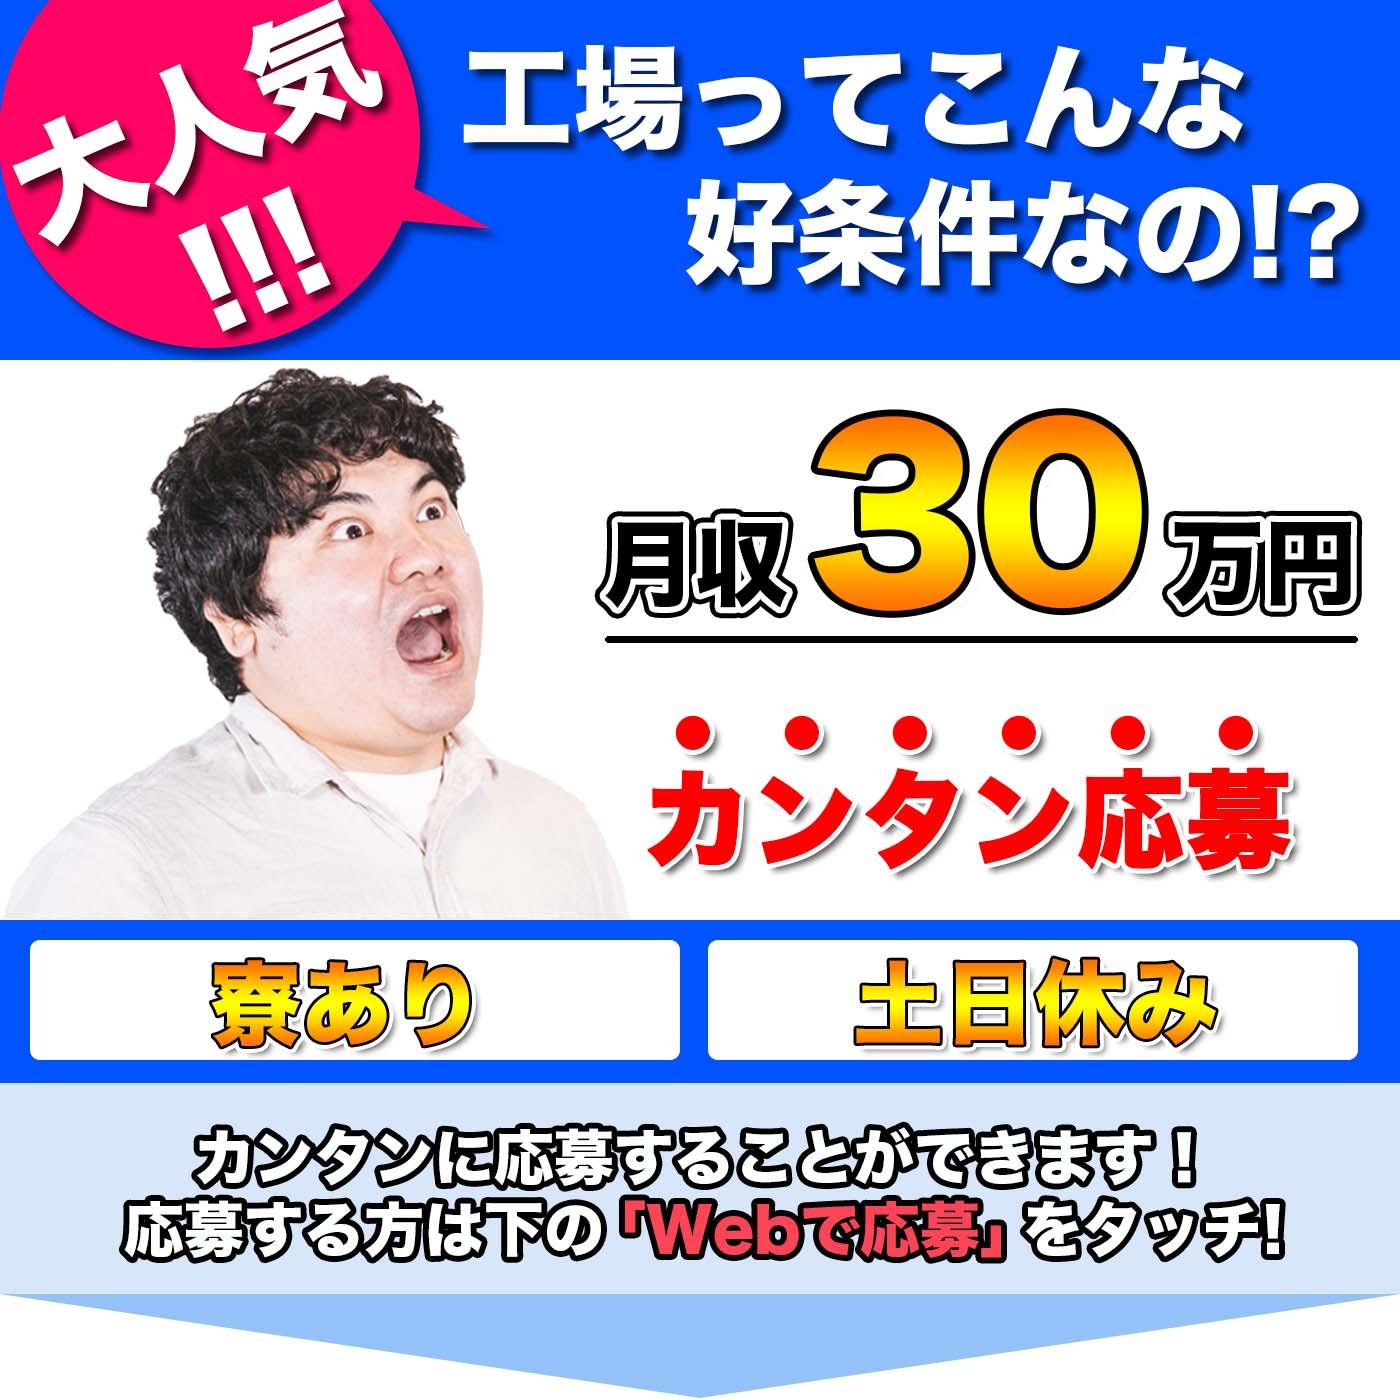 Kyujin24 ax 6